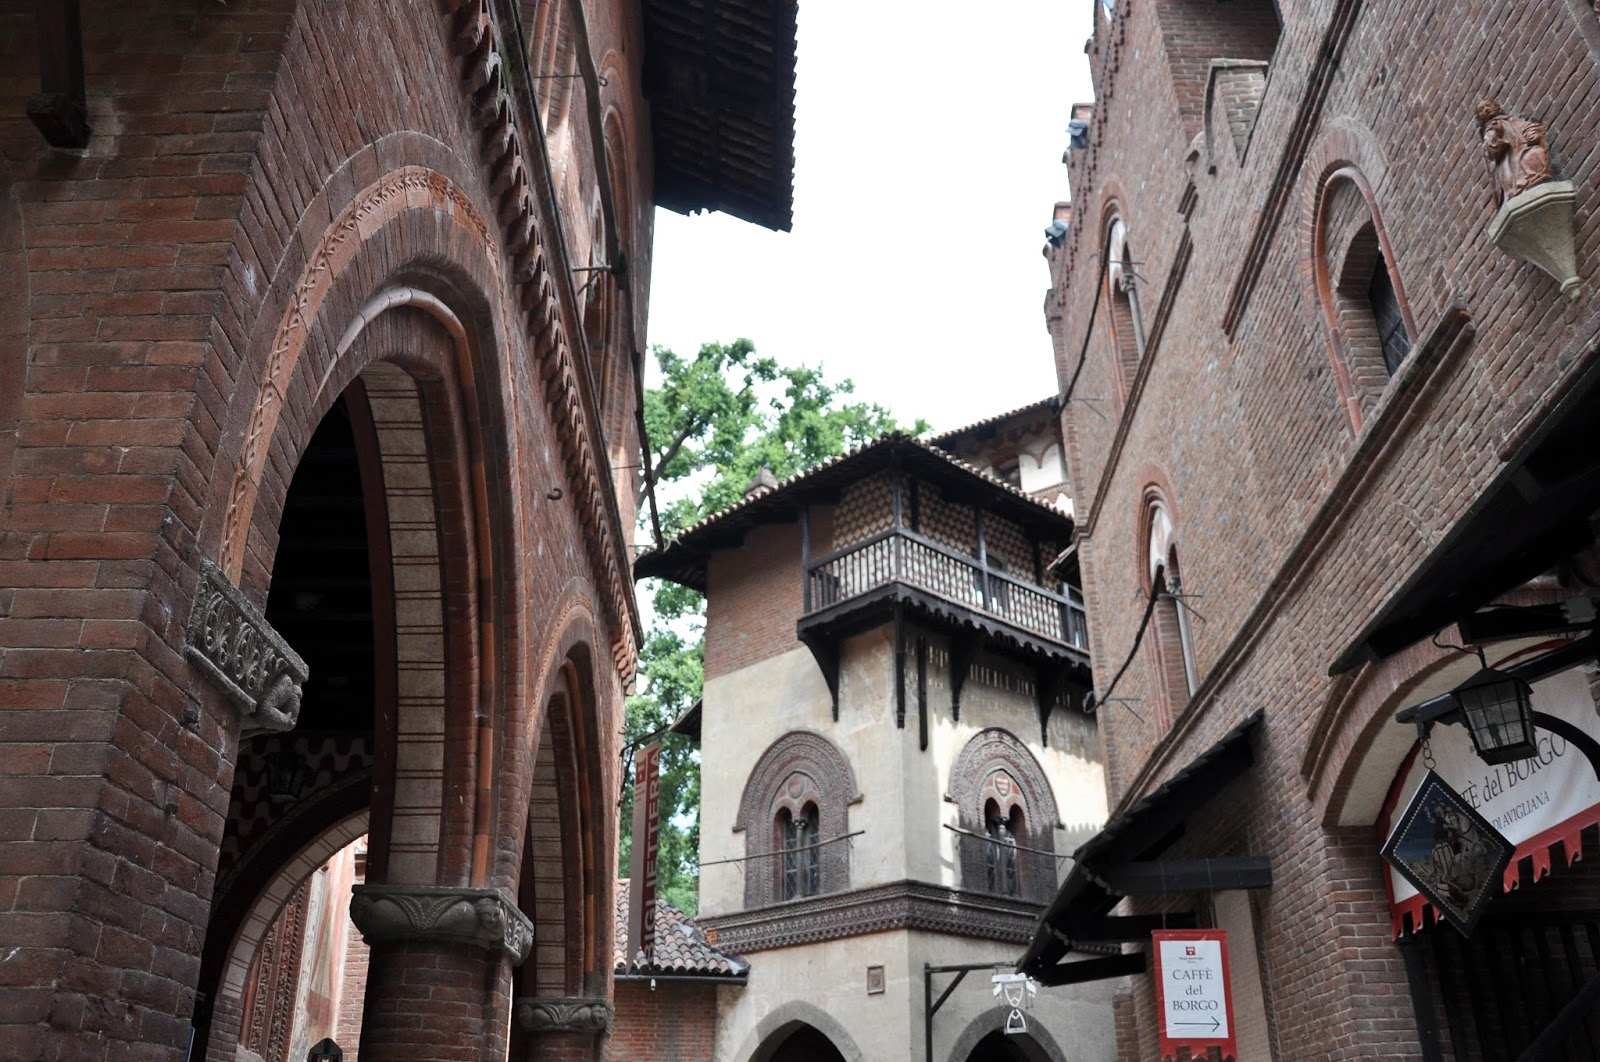 Borgo Medievale, Parco del Valentino, Turin, Italy